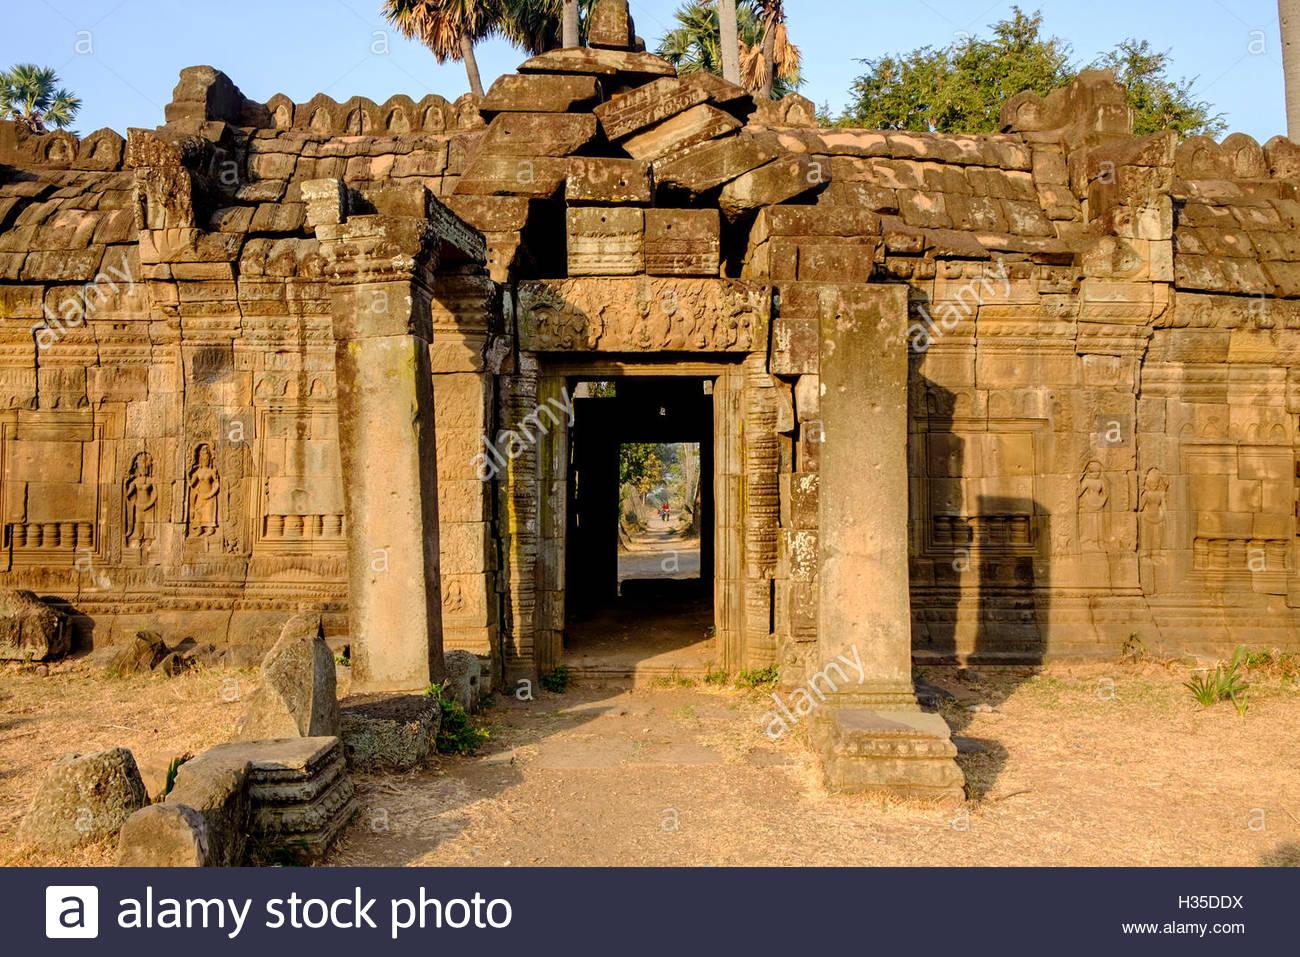 Vat Nokor, Angkorian sanctuary dated 11th century, Kompong Cham (Kampong Cham), Cambodia - Stock Image